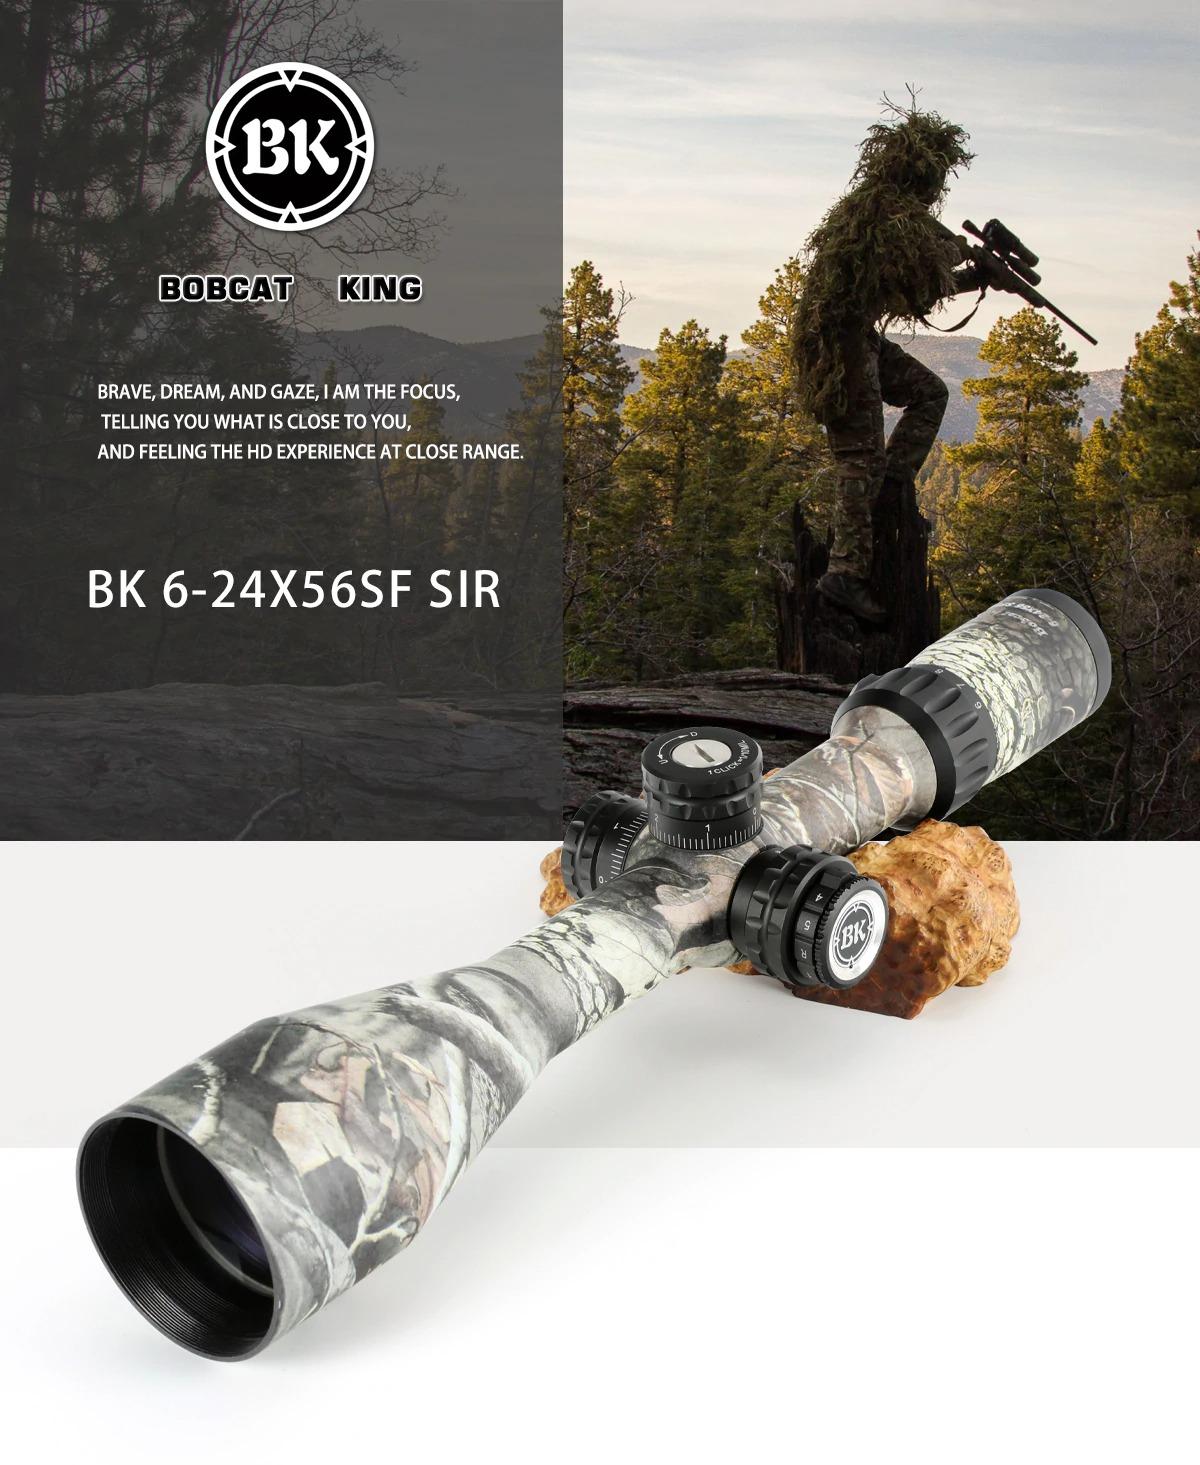 Bobcat King 6-24X56 SFIR Riflescope Airsoft Hunting Rifle Scope 1